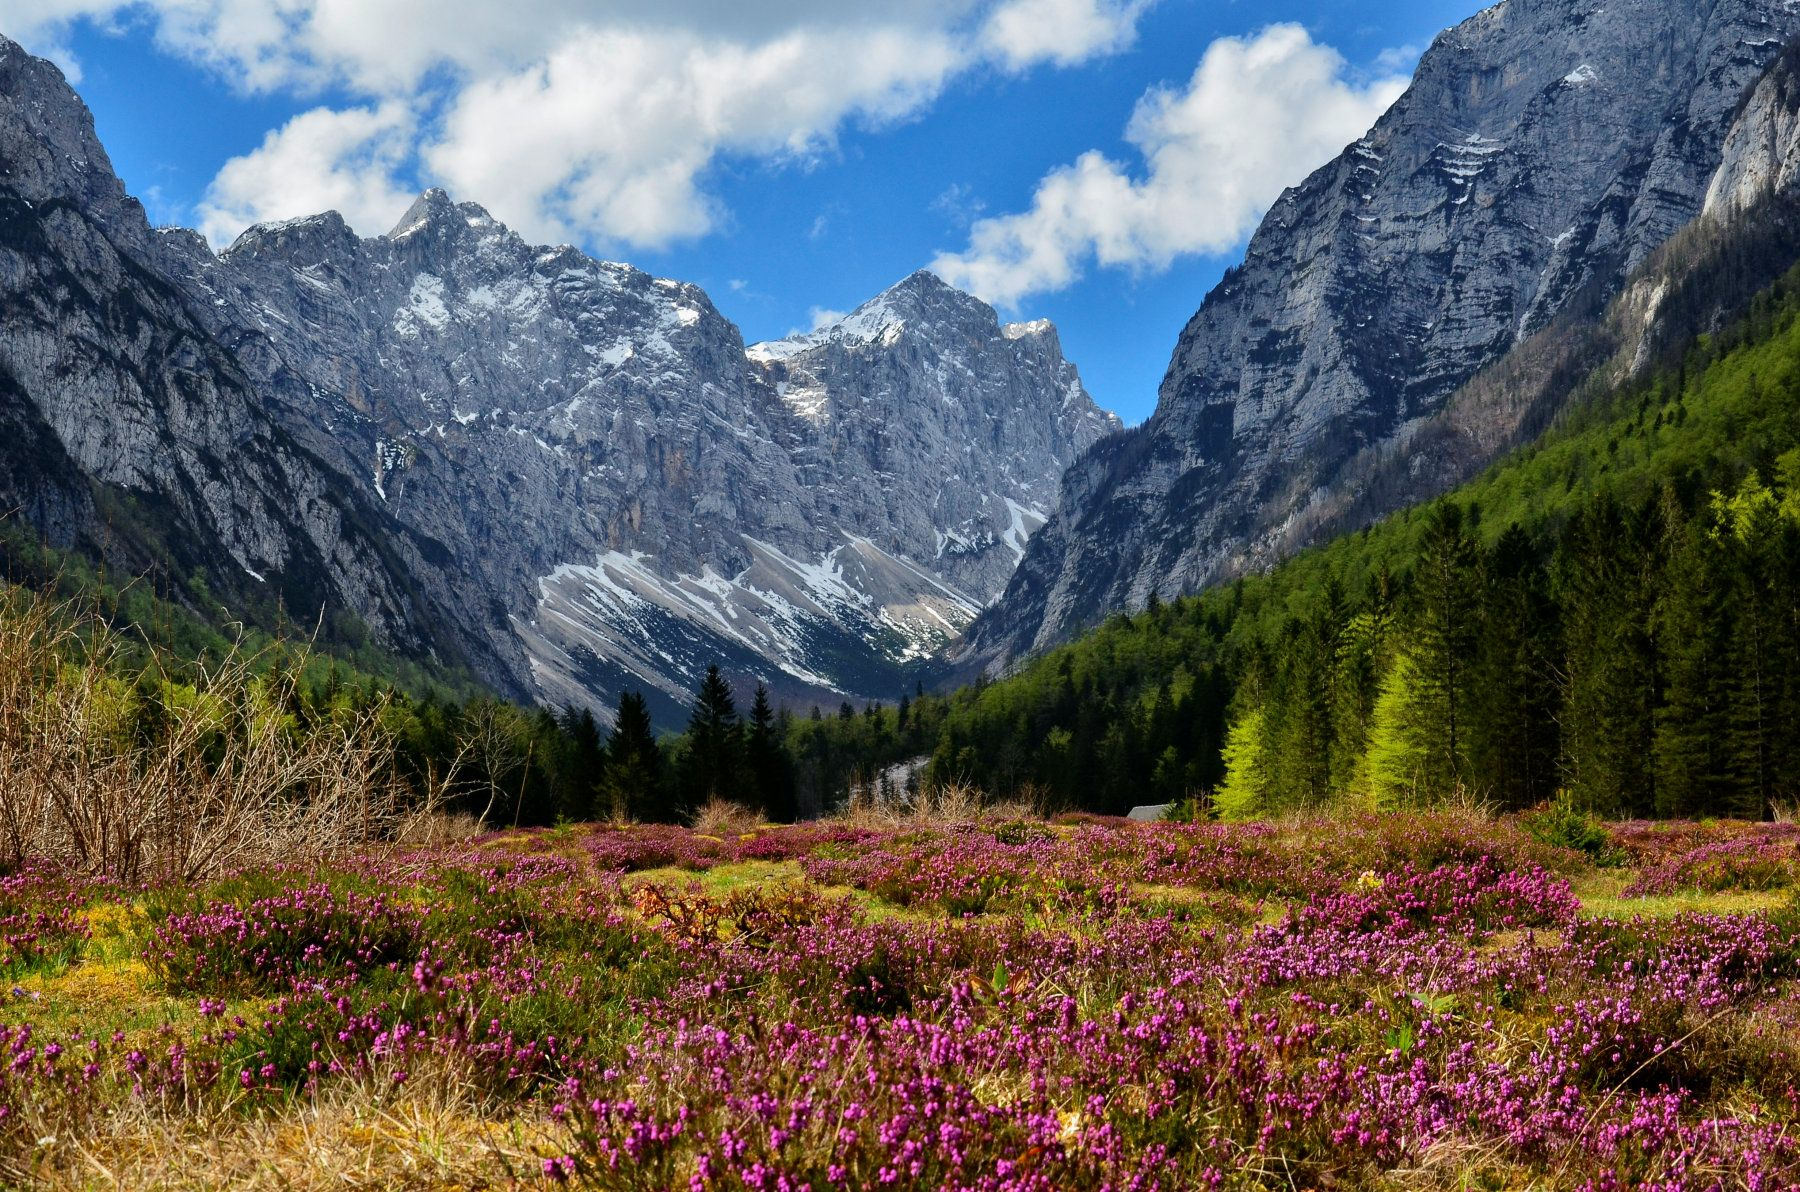 krma-alpine-valley.jpg (1800×1192)